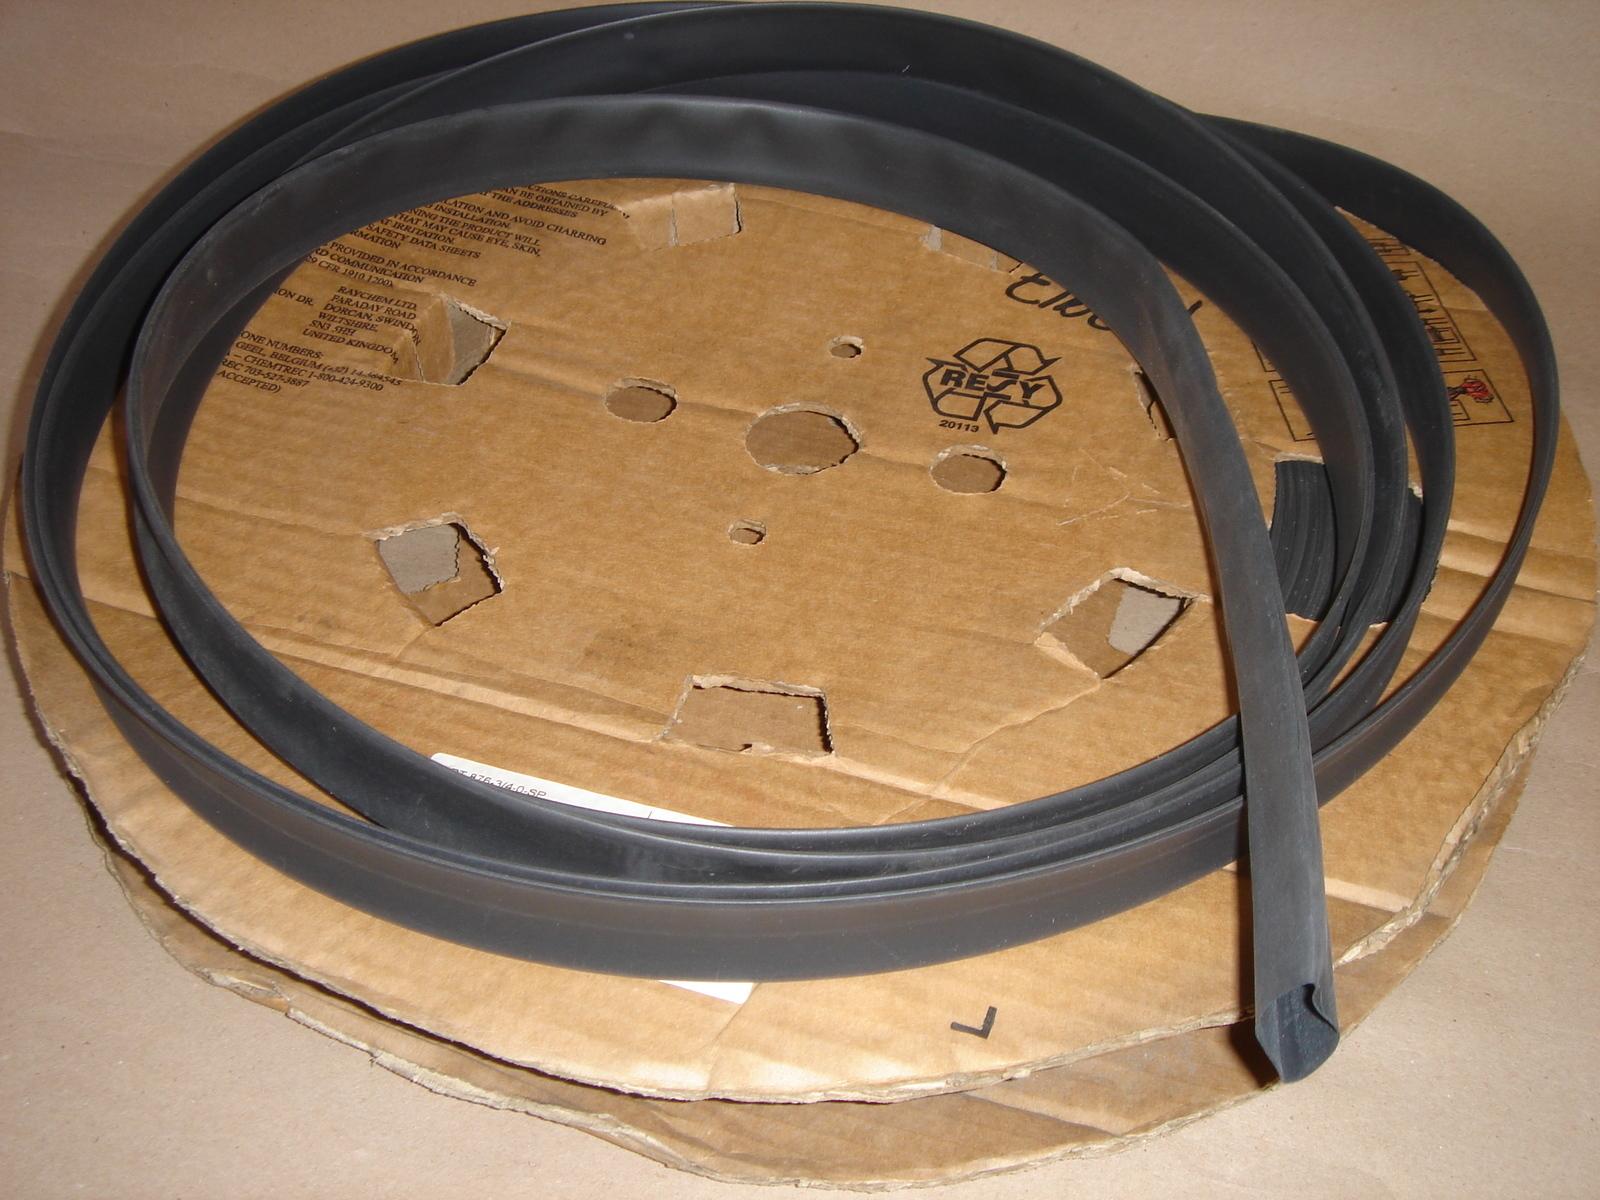 Termokahanev toru Ø6,4/3,2 mm, must, Plastronic